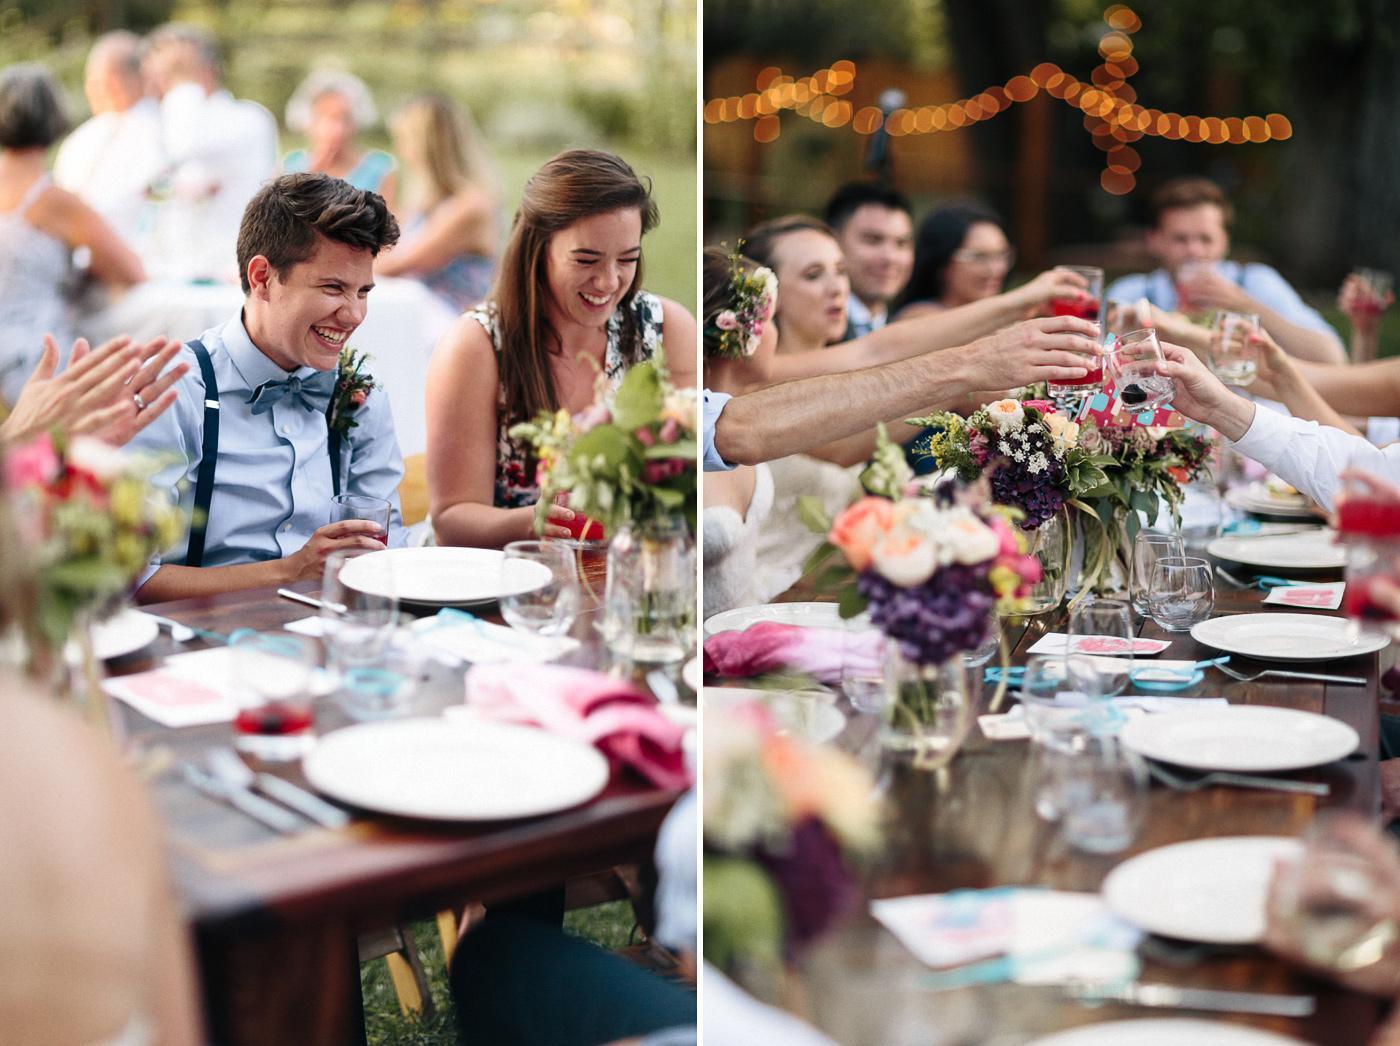 Lyons-Farmette-Wedding-Photographer-Lucy-Austin-Flash-Mob-Dance-59.jpg